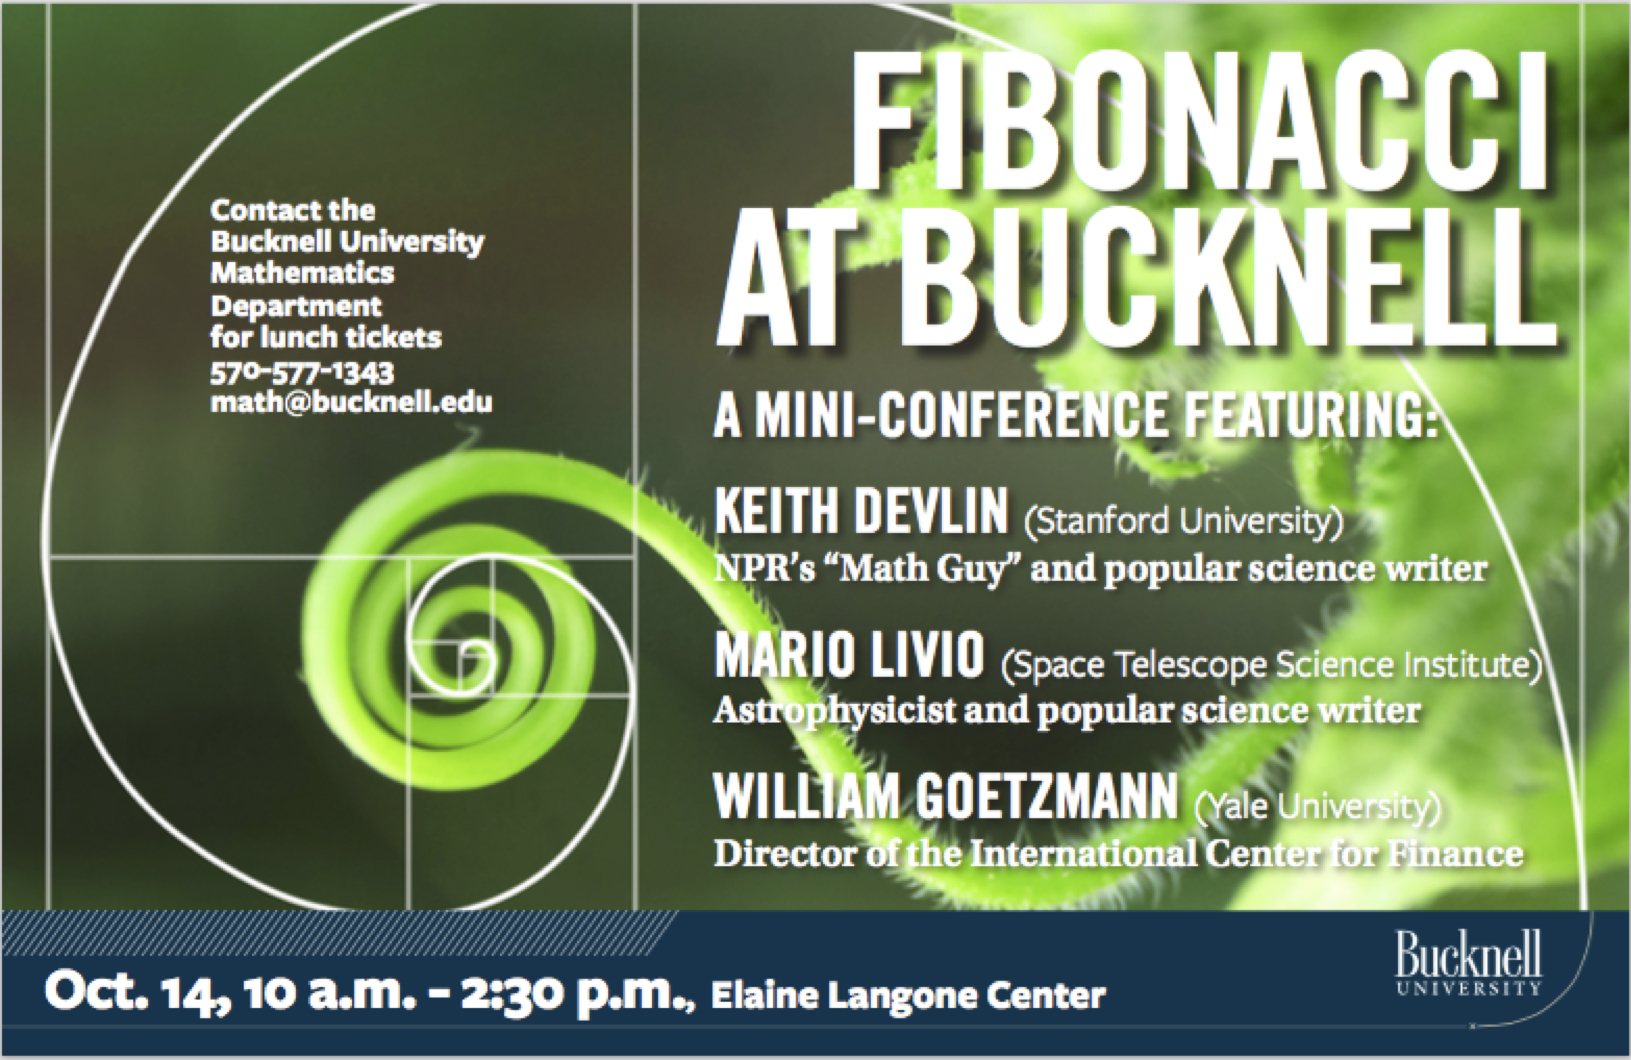 Fibonacci at Bucknell!